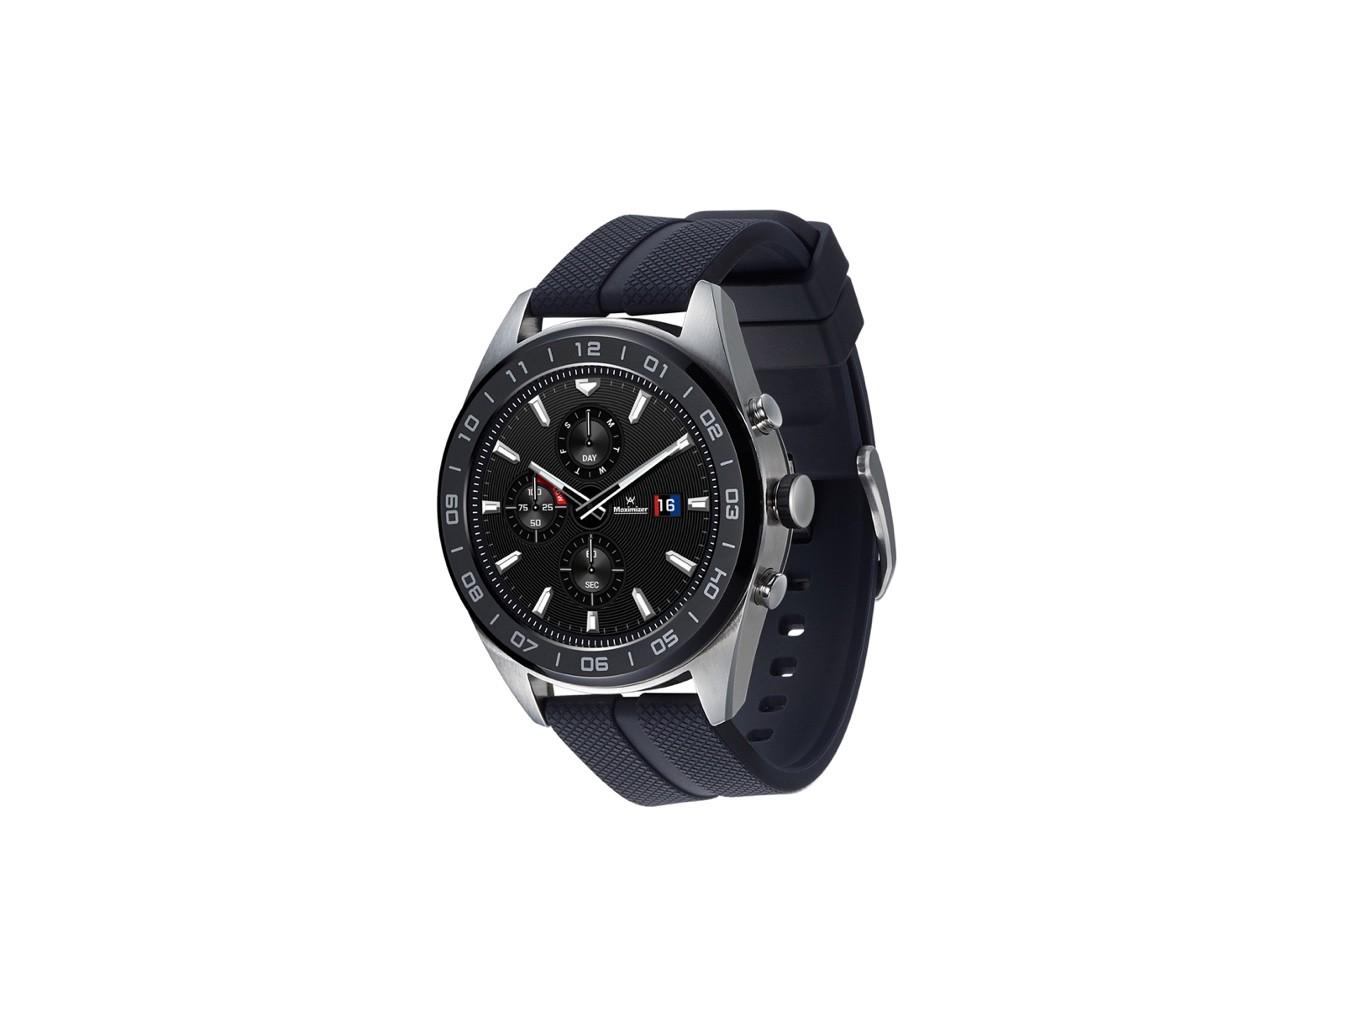 W7Manecillas Un Inteligente Wear Mecánicas En Reloj Lg Os Watch Con BorCWxde